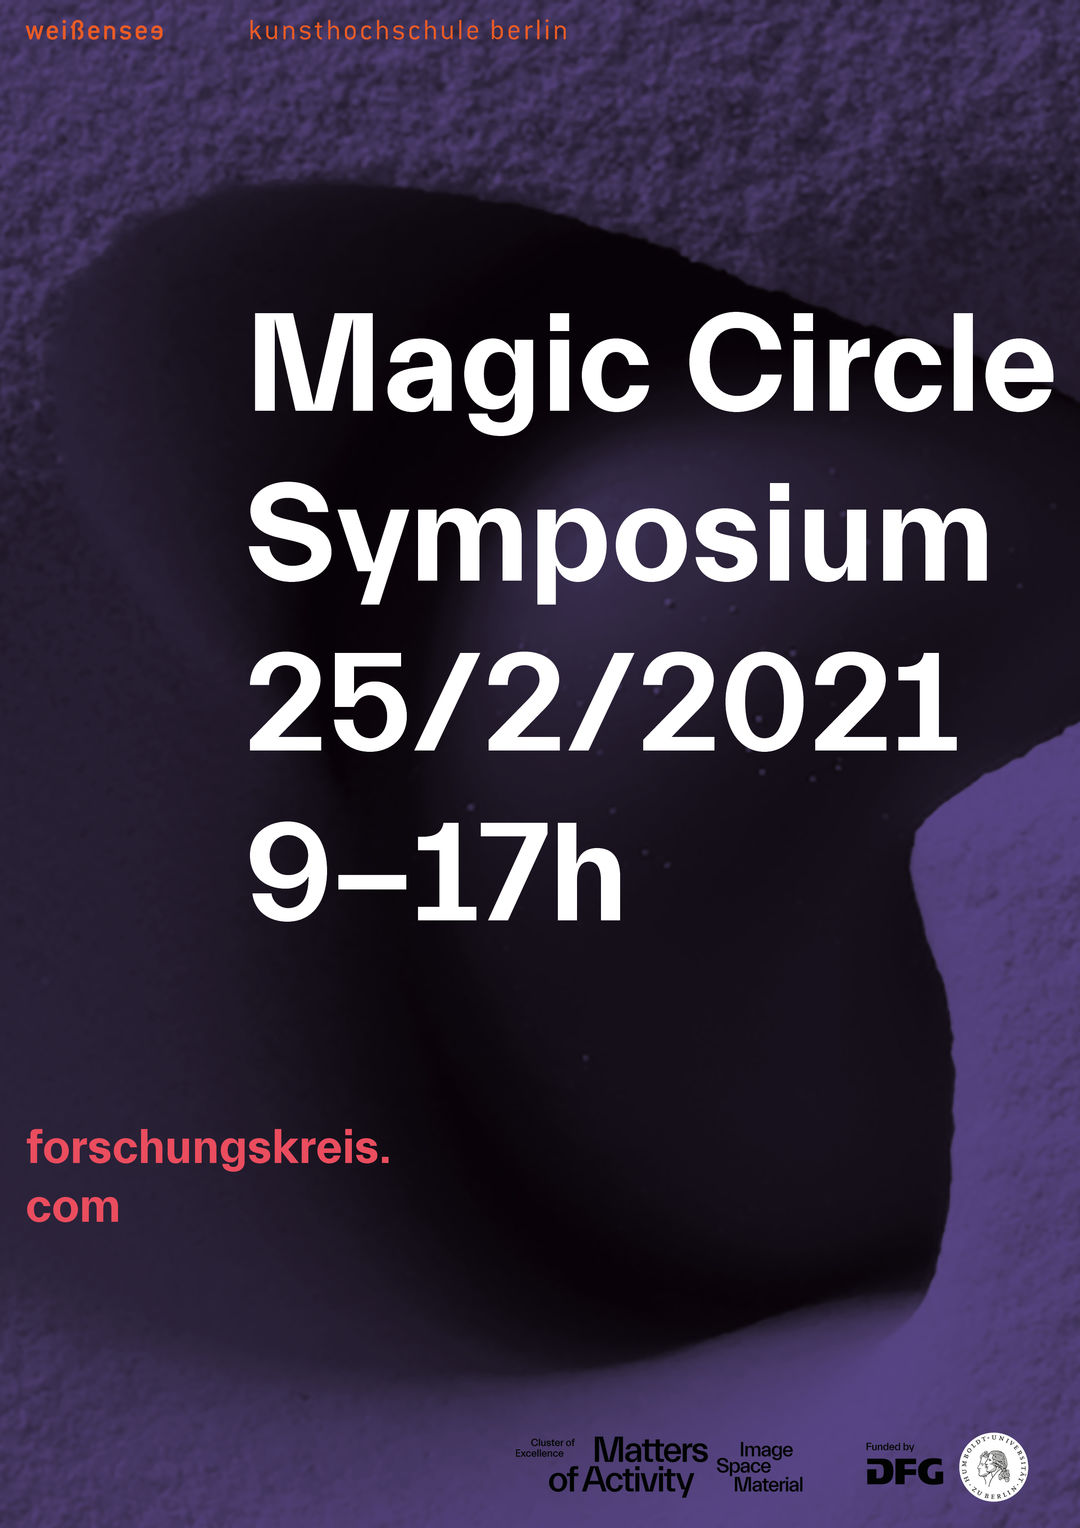 Magic Circle Symposium weissensee school of art and design berlin, »Erosive Modeling«. Copyright: Kristin Dolz.